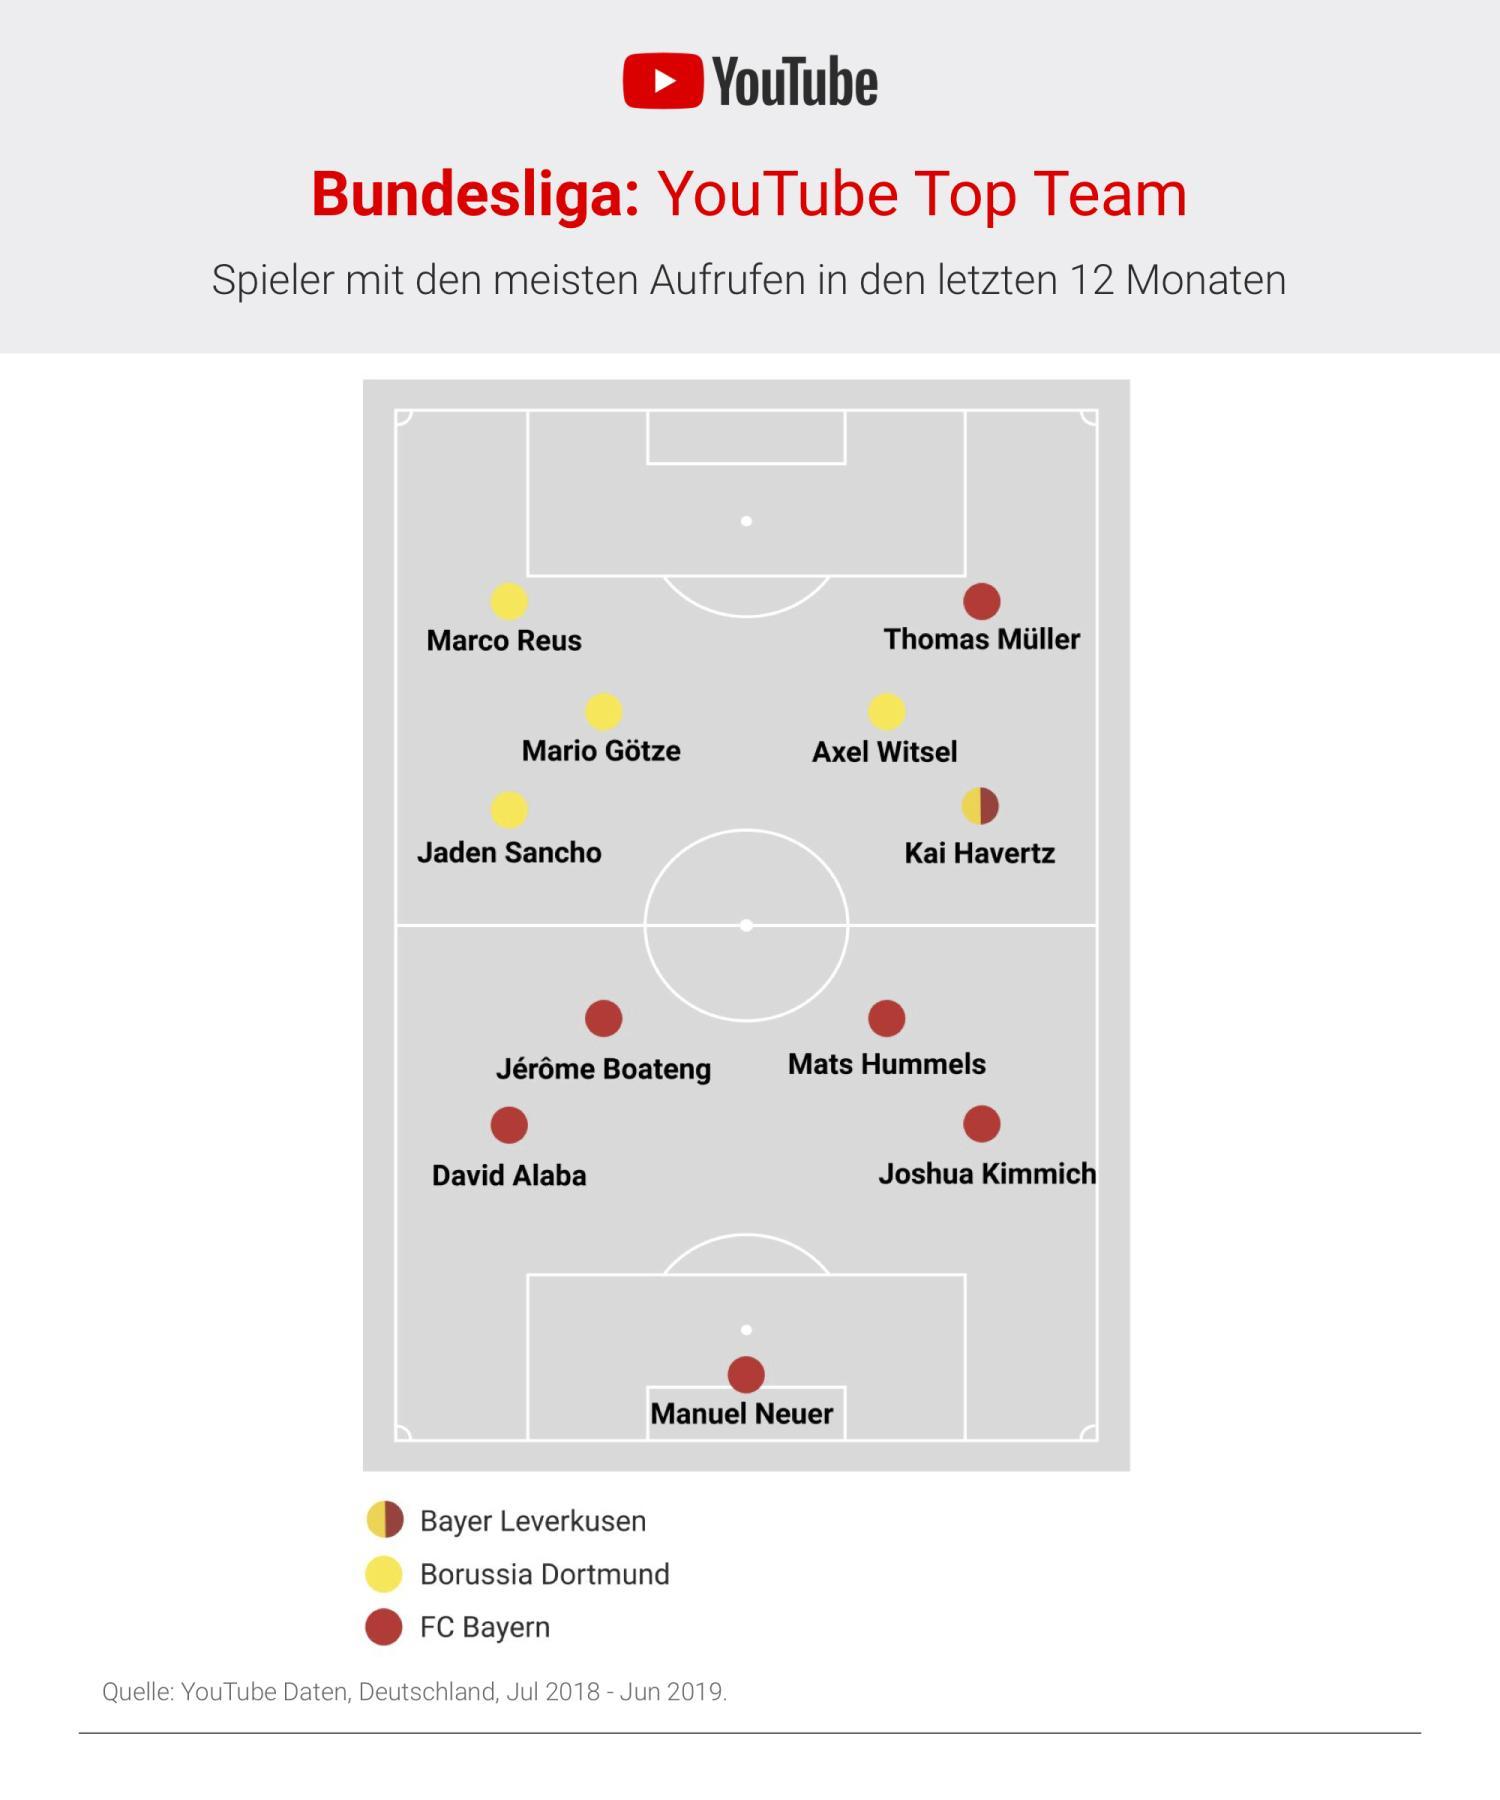 youtube top team